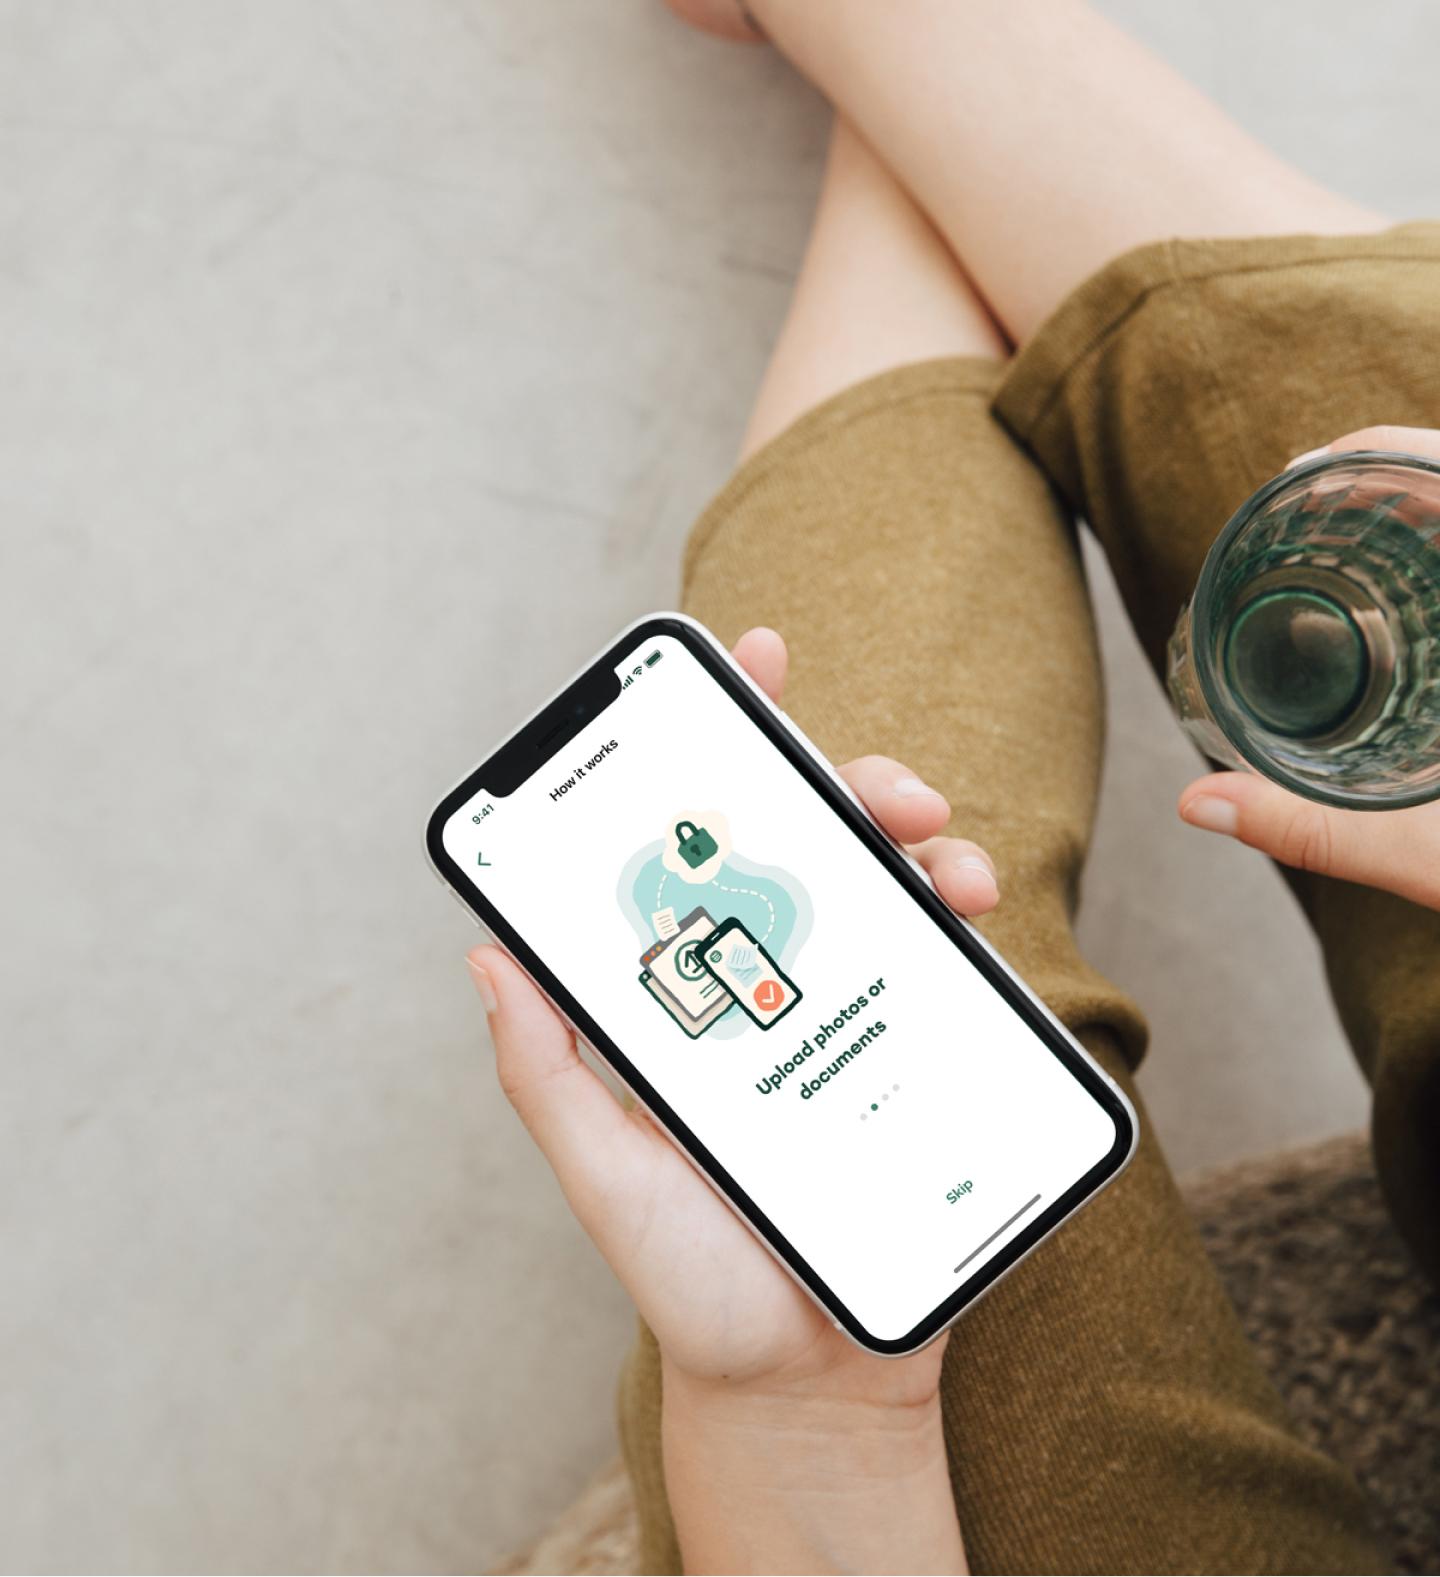 Brella health insurance app